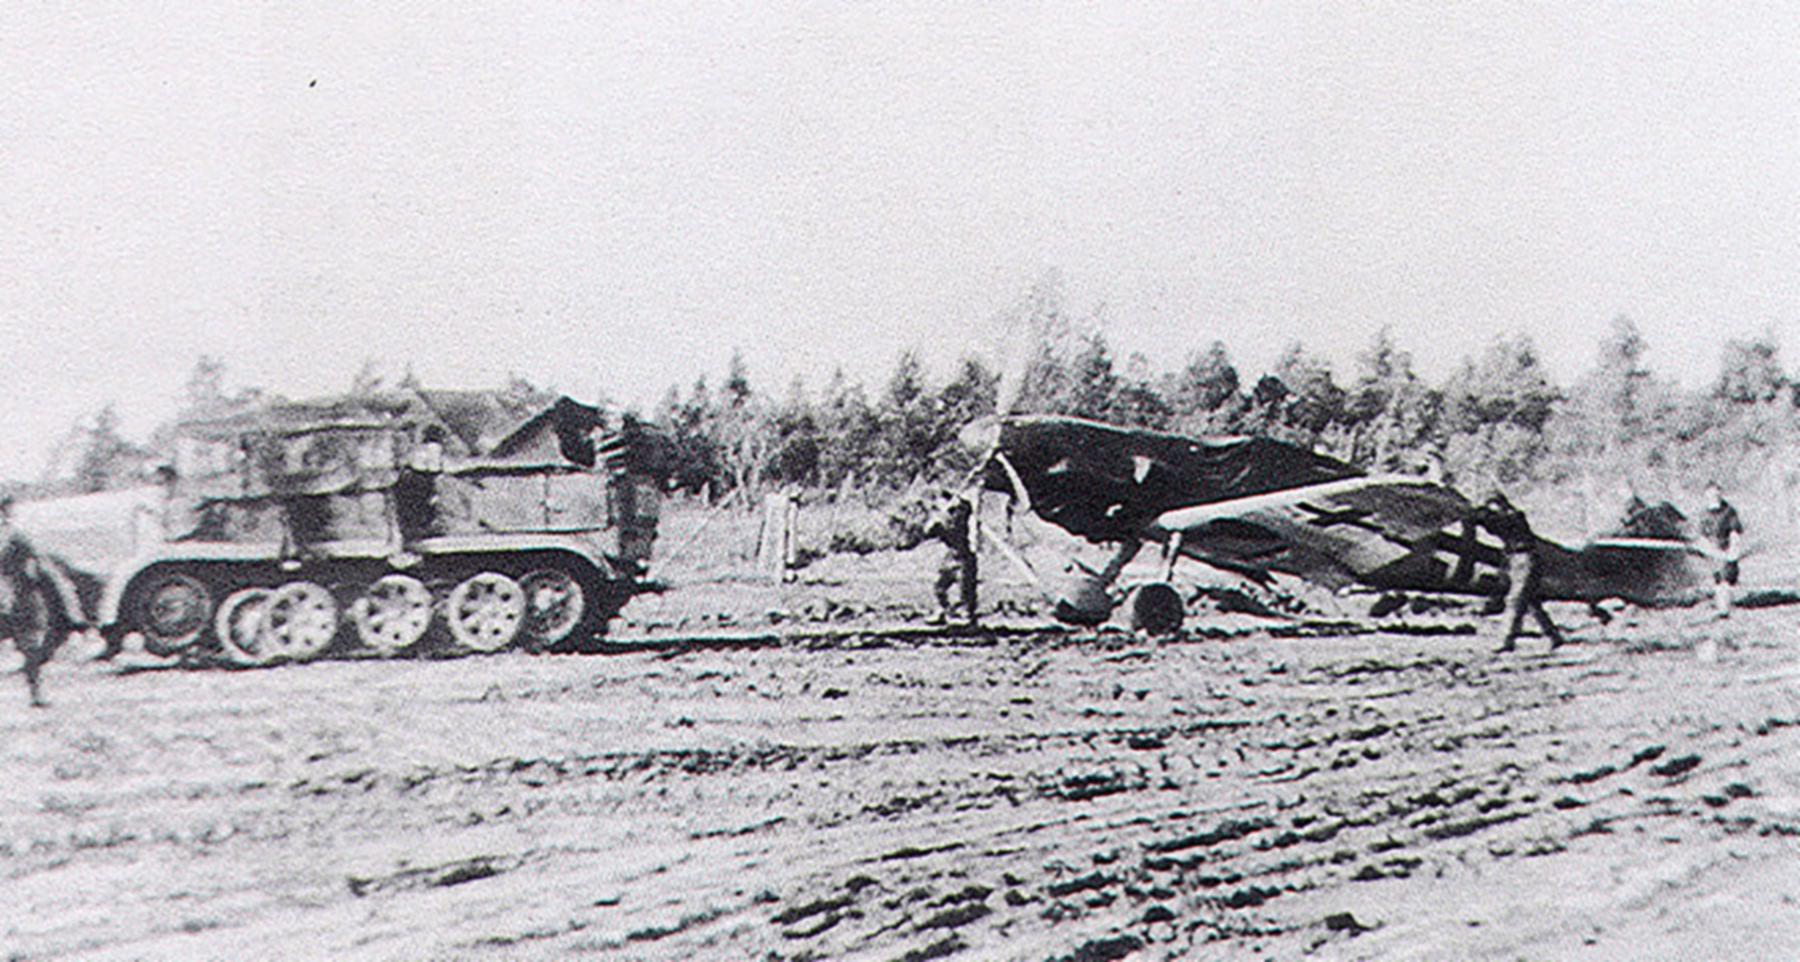 Messerschmitt Bf 109F JG54 being towed by a SdKfz 7 half track Russia 1941 01